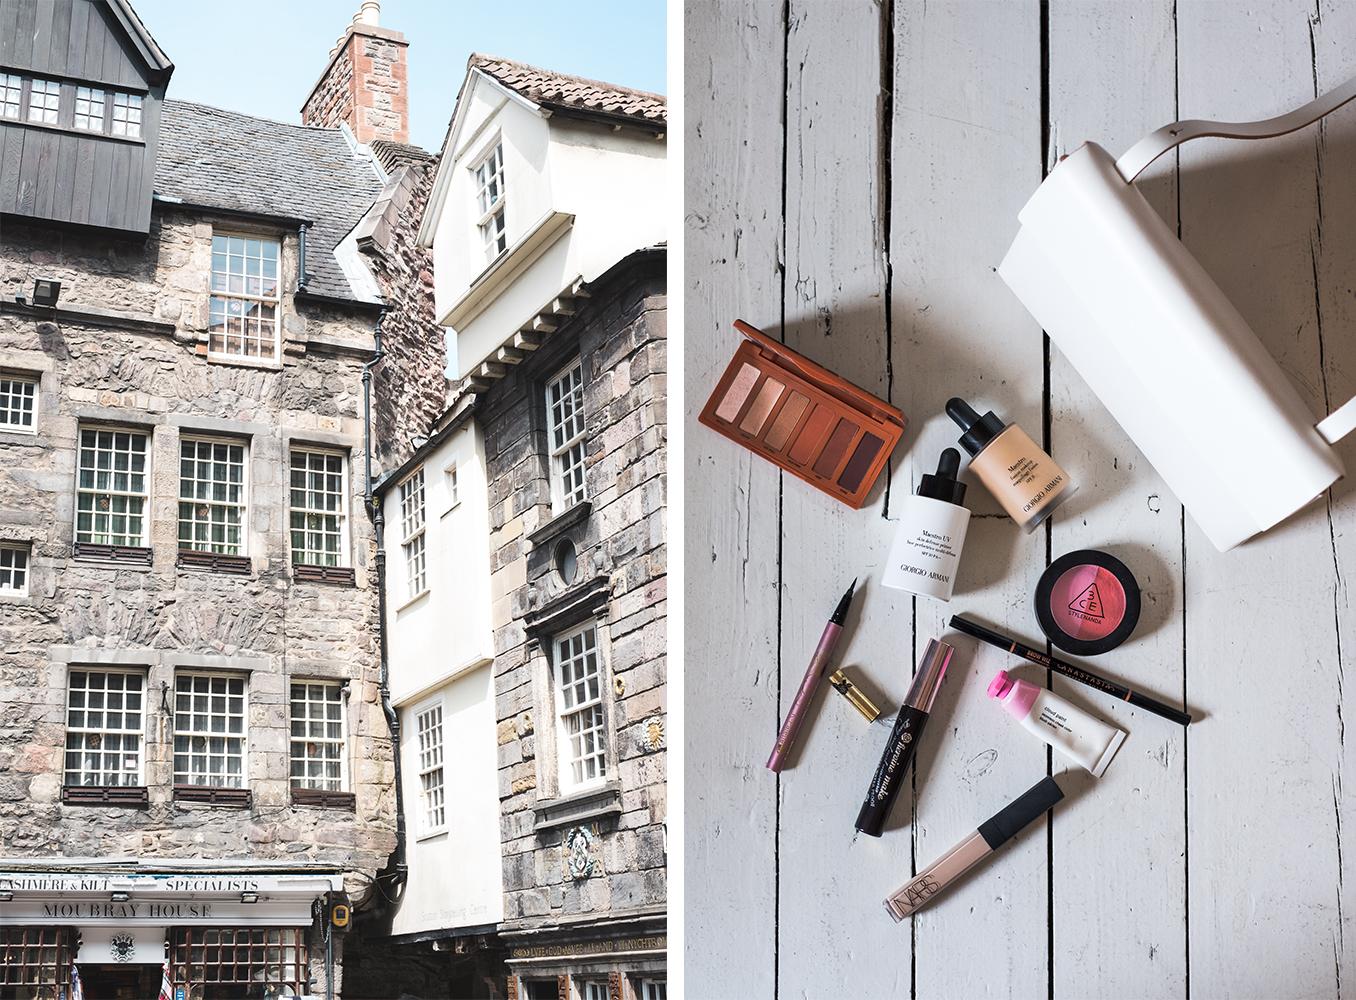 Edinburgh Wedding buildings and make up